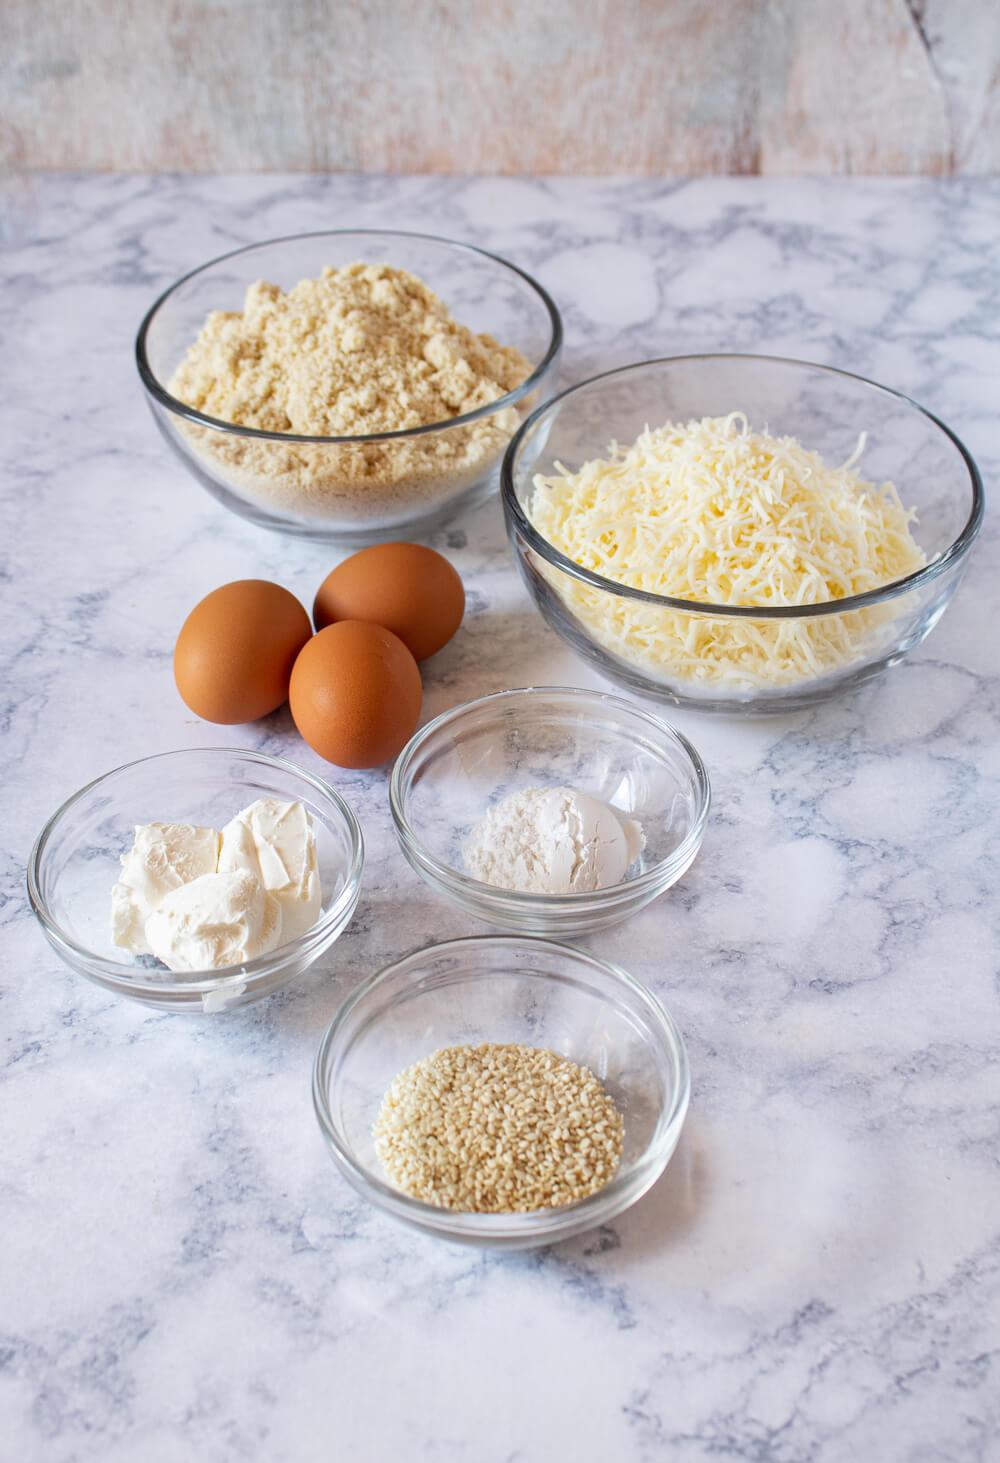 Low Carb Keto Sesame Bagel Ingredients